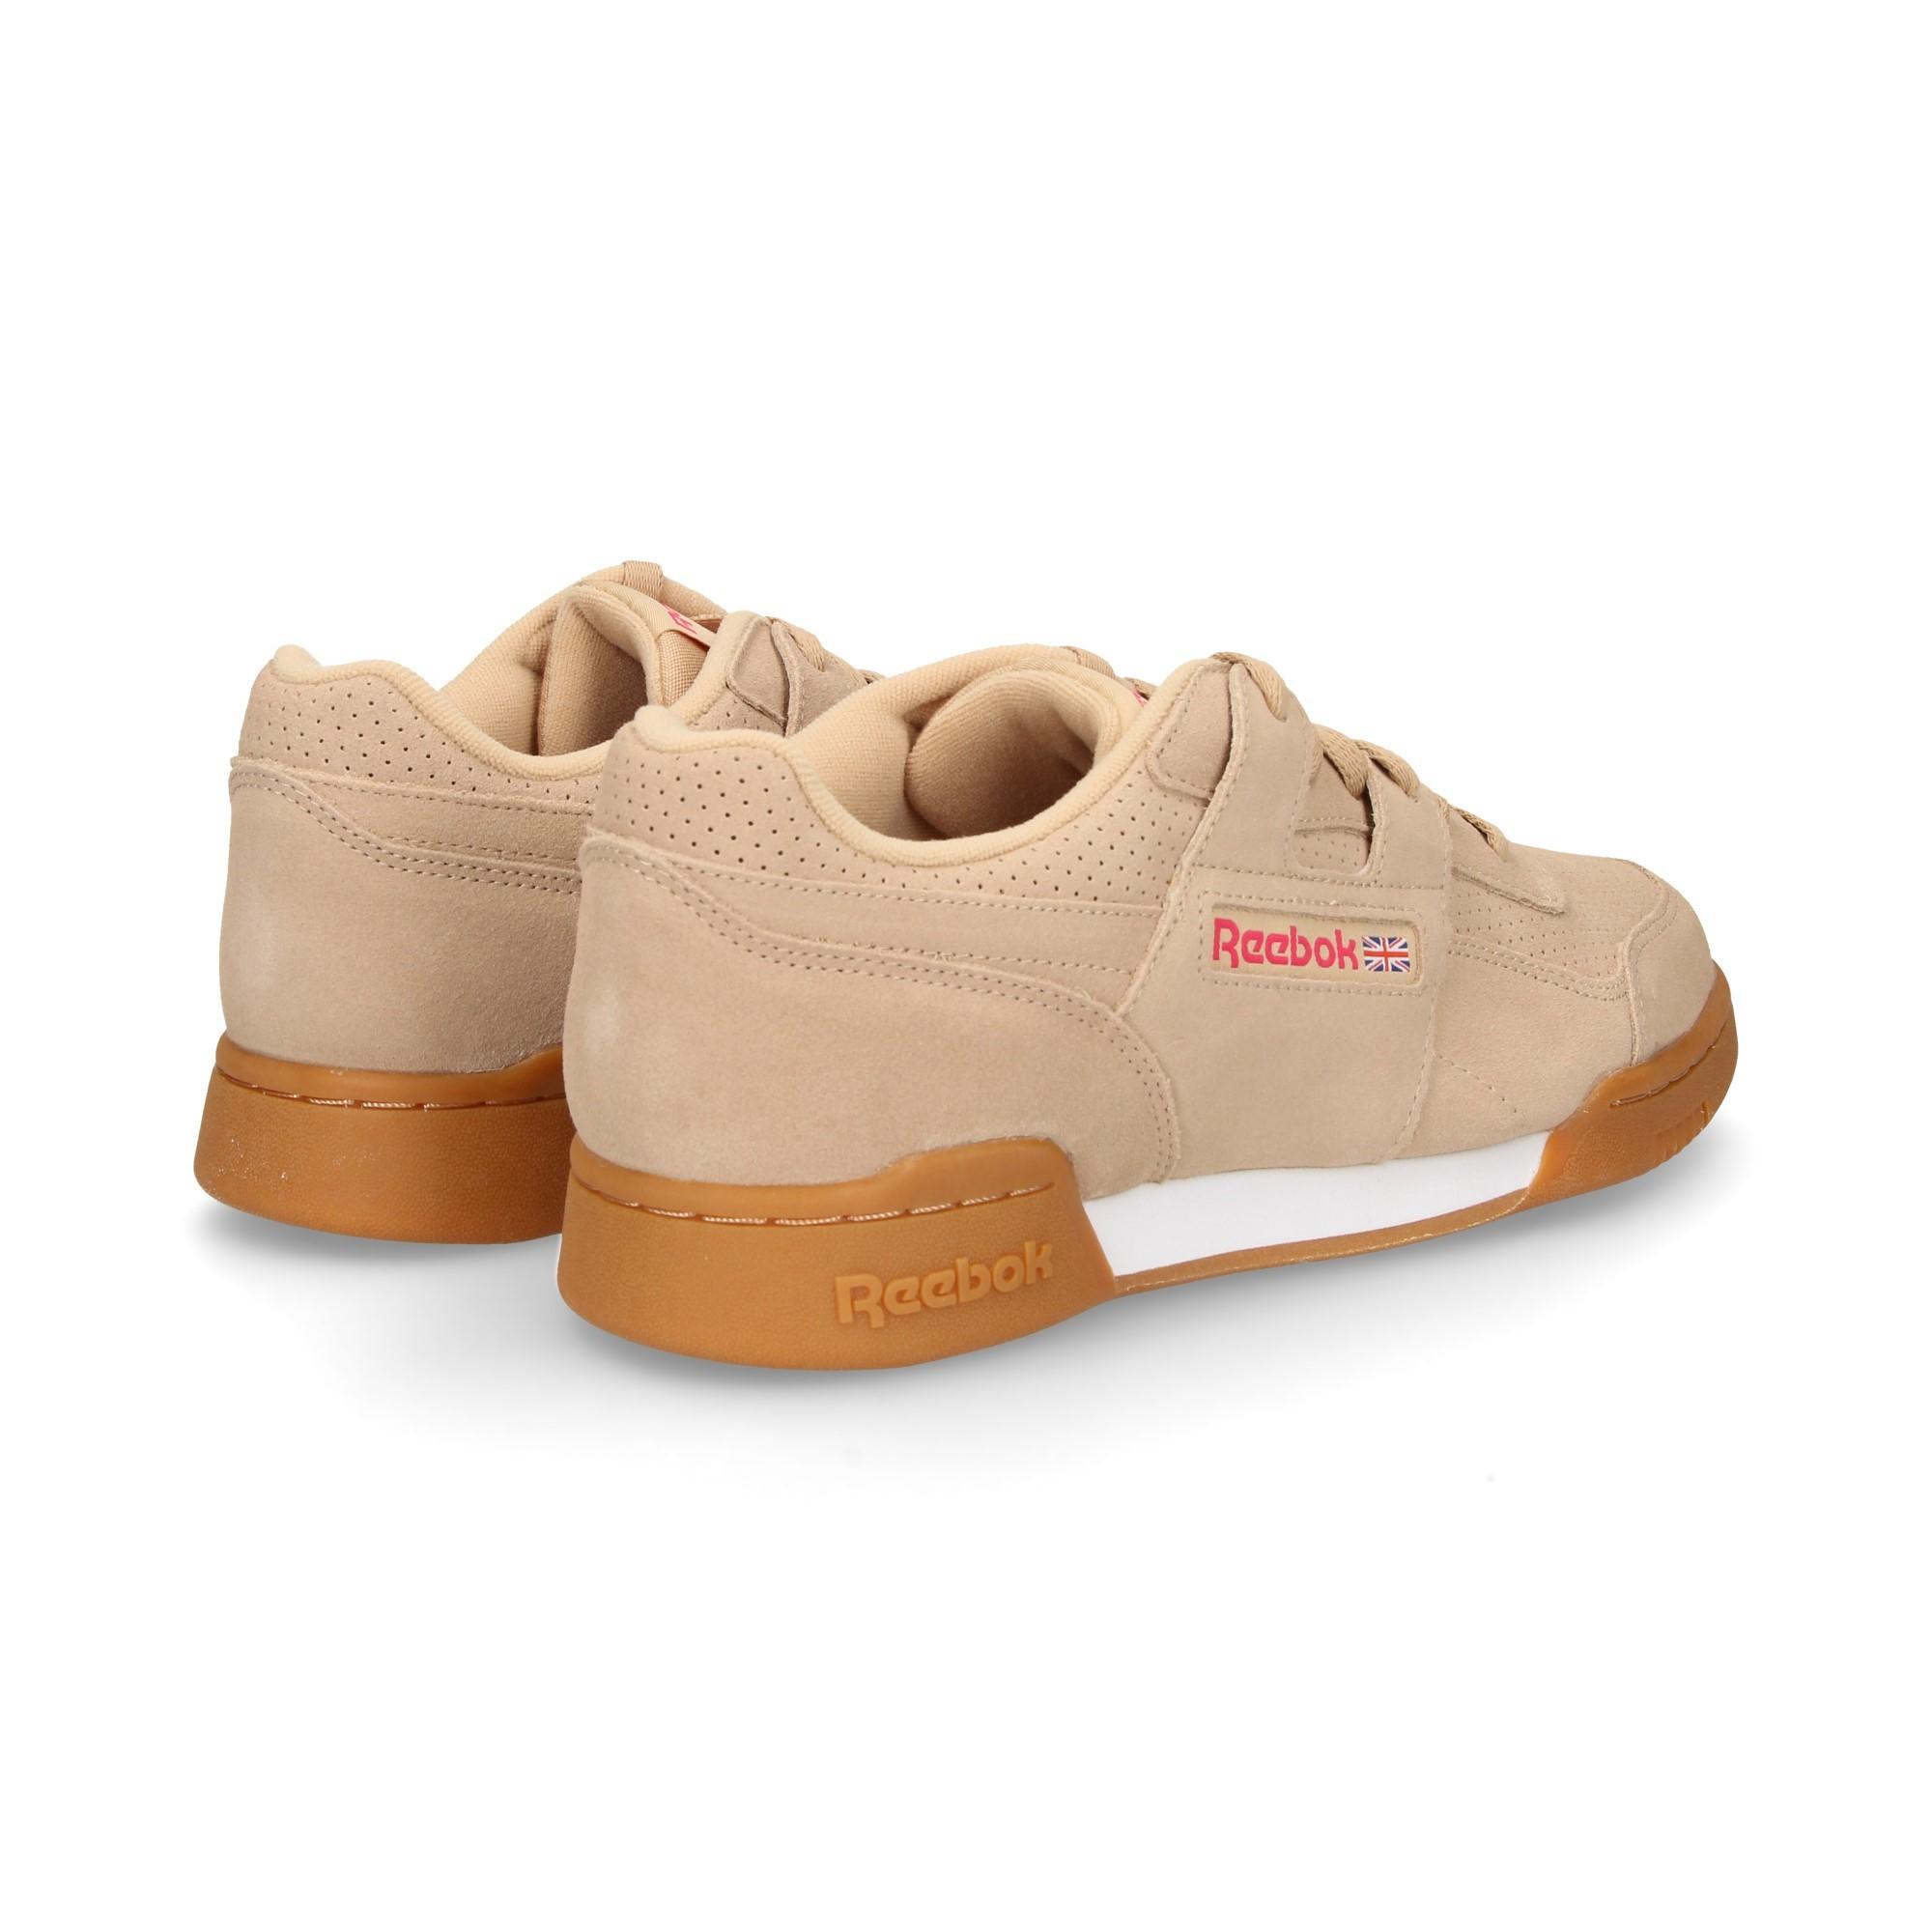 REEBOK Men's sneakers CN5195 SPGSAHPINWHT